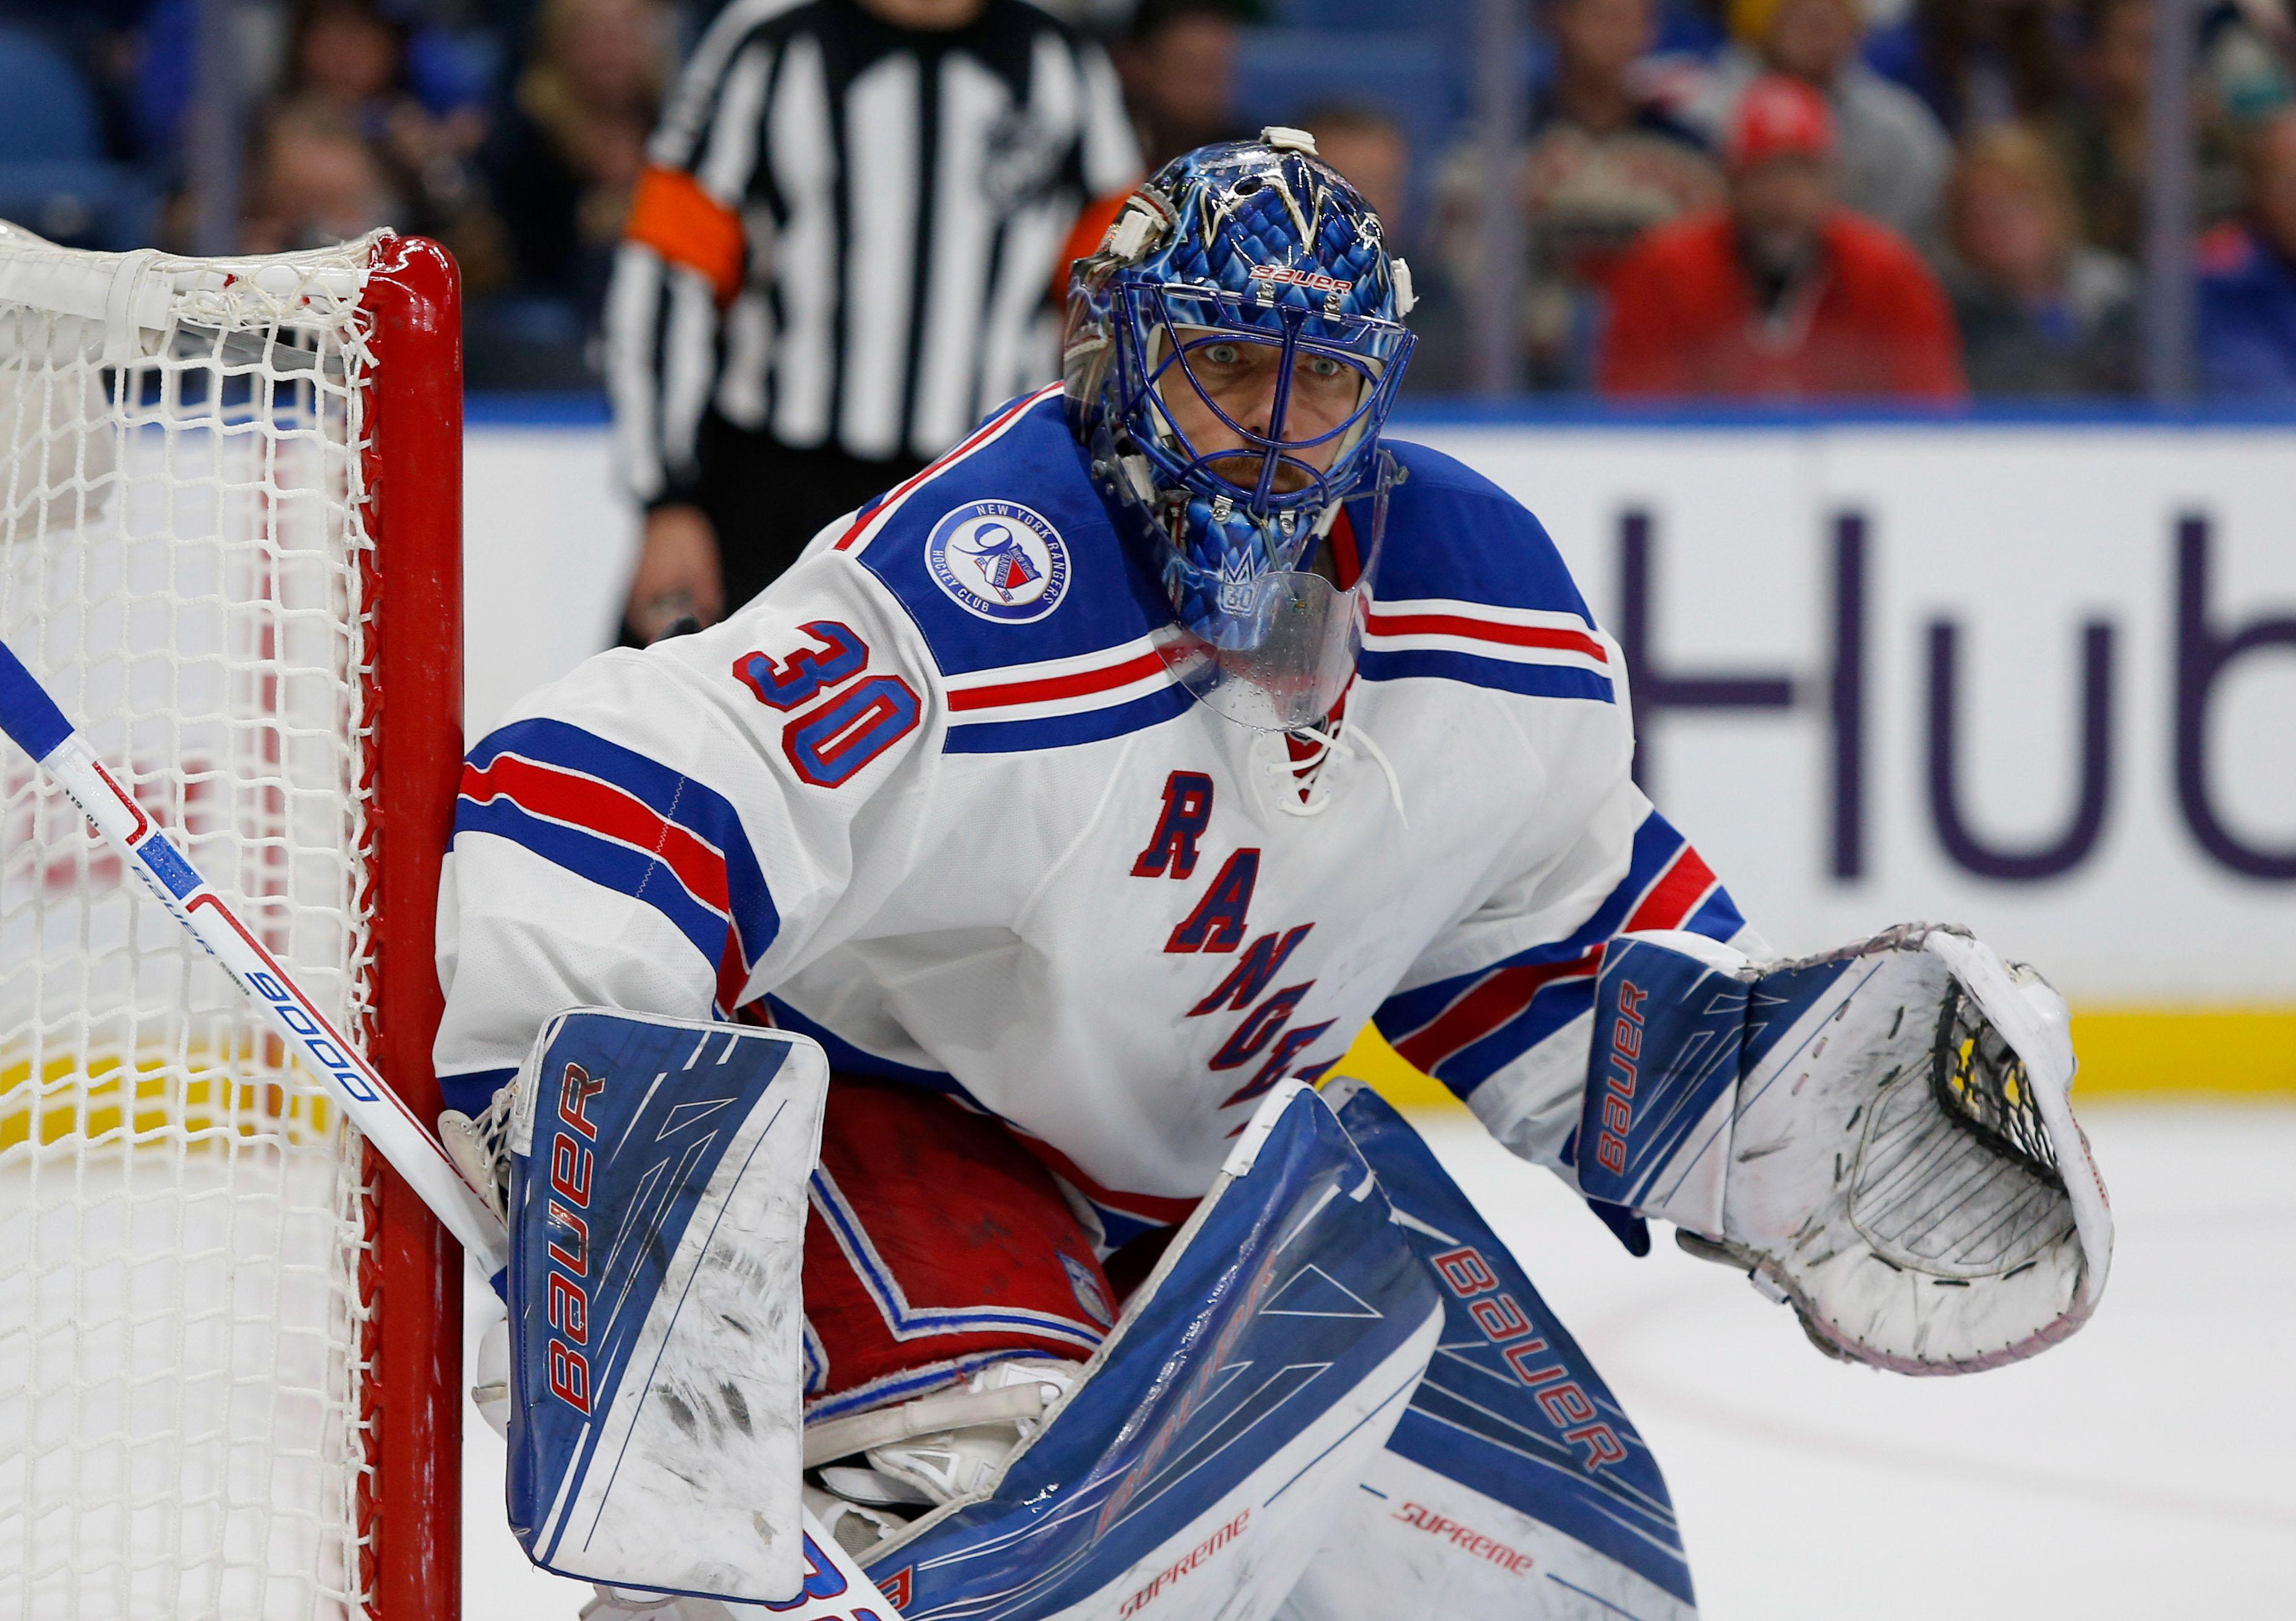 Lundqvist reaches 400 victories; Rangers' win streak hits 5